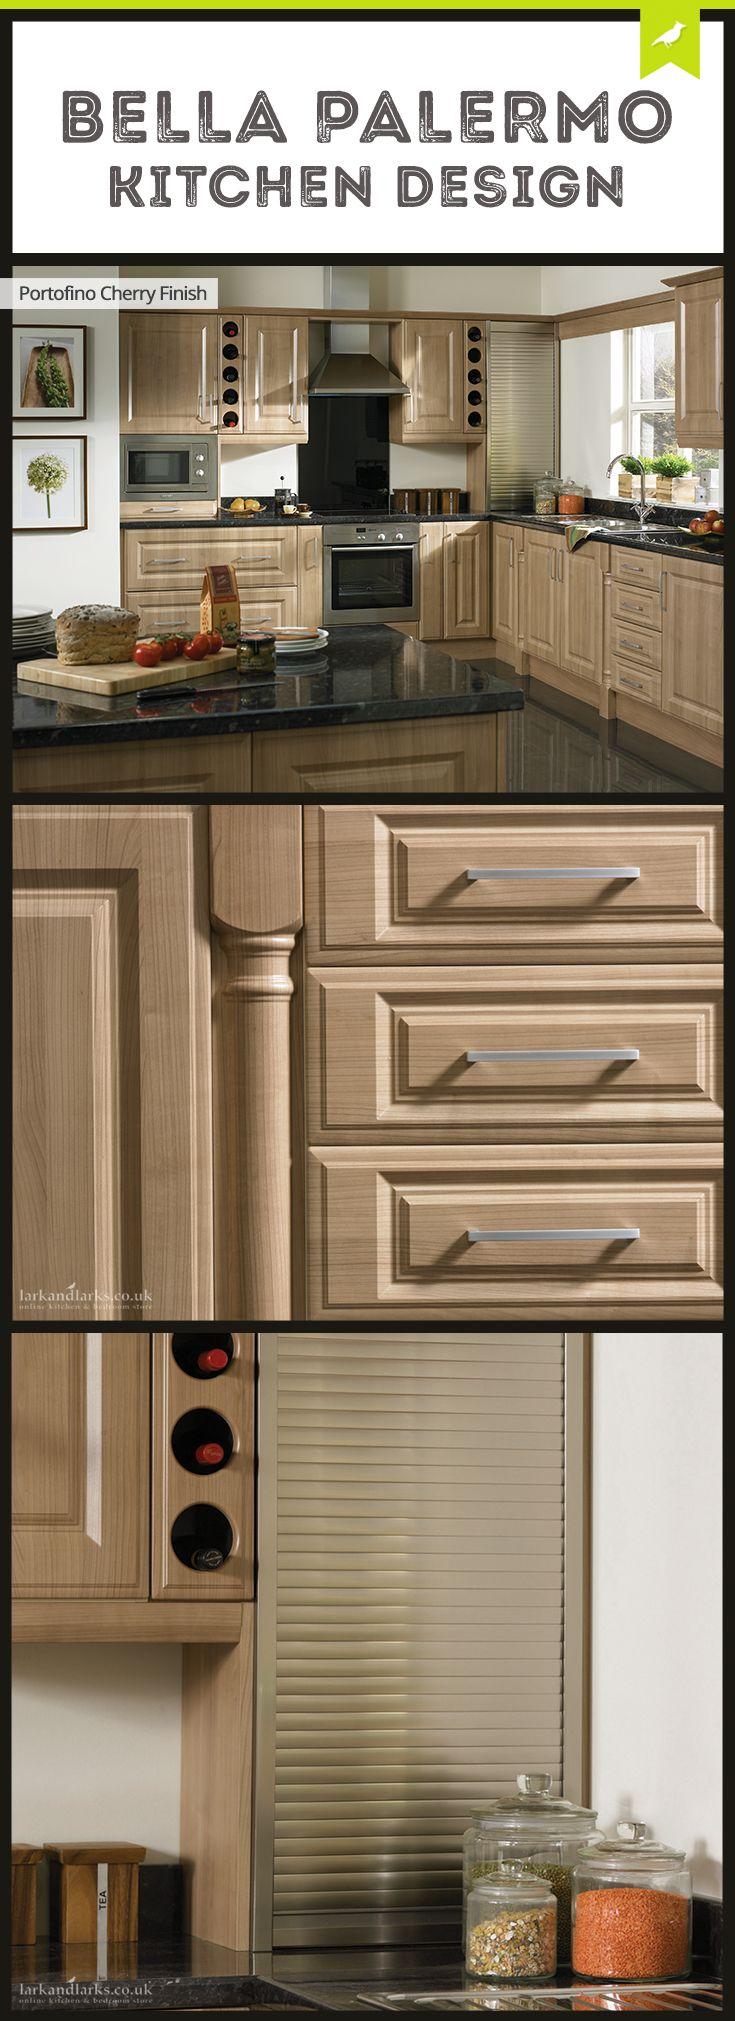 64 mejores imágenes de Kitchen Designs en Pinterest   Puertas de la ...